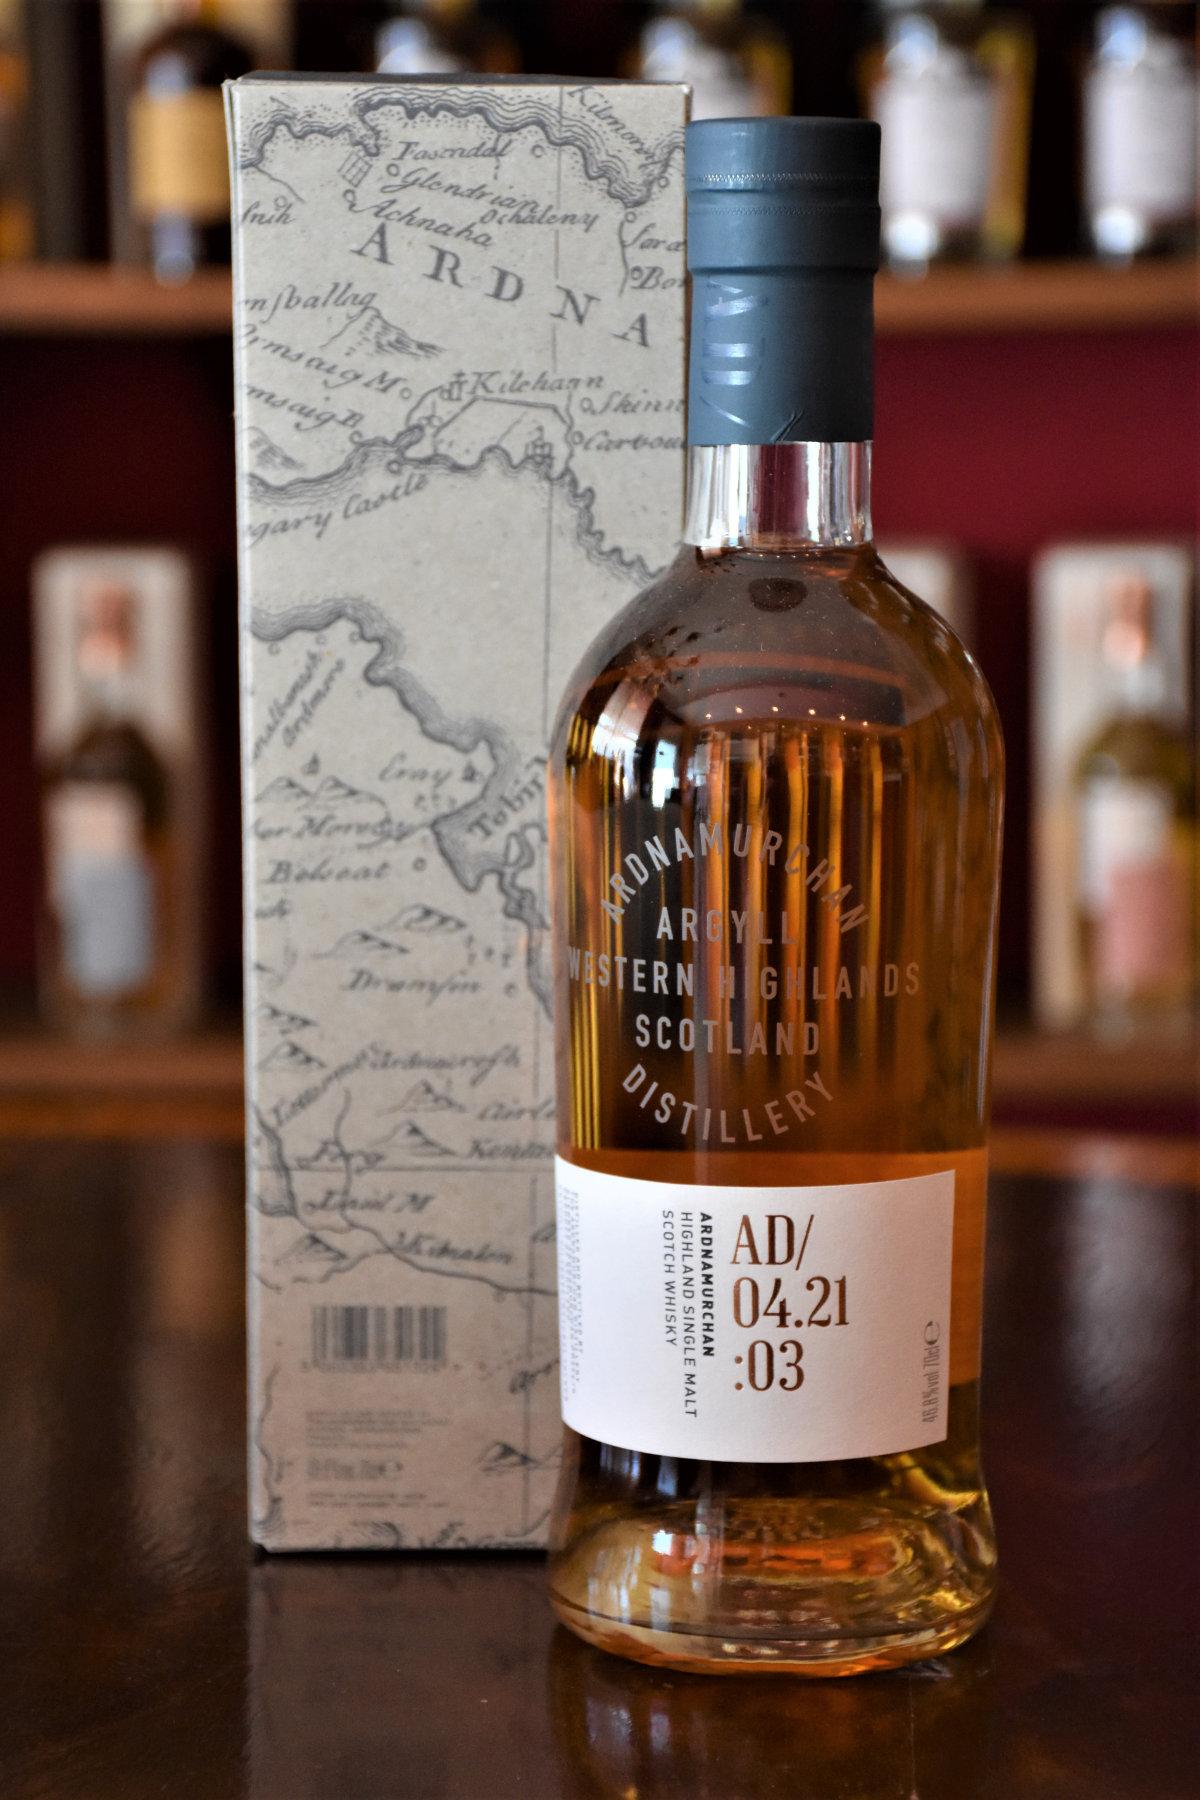 Ardnamurchan Batch 03 - AD/04.21:03, 46,8% Alc.Vol., Distillery Original Bottling